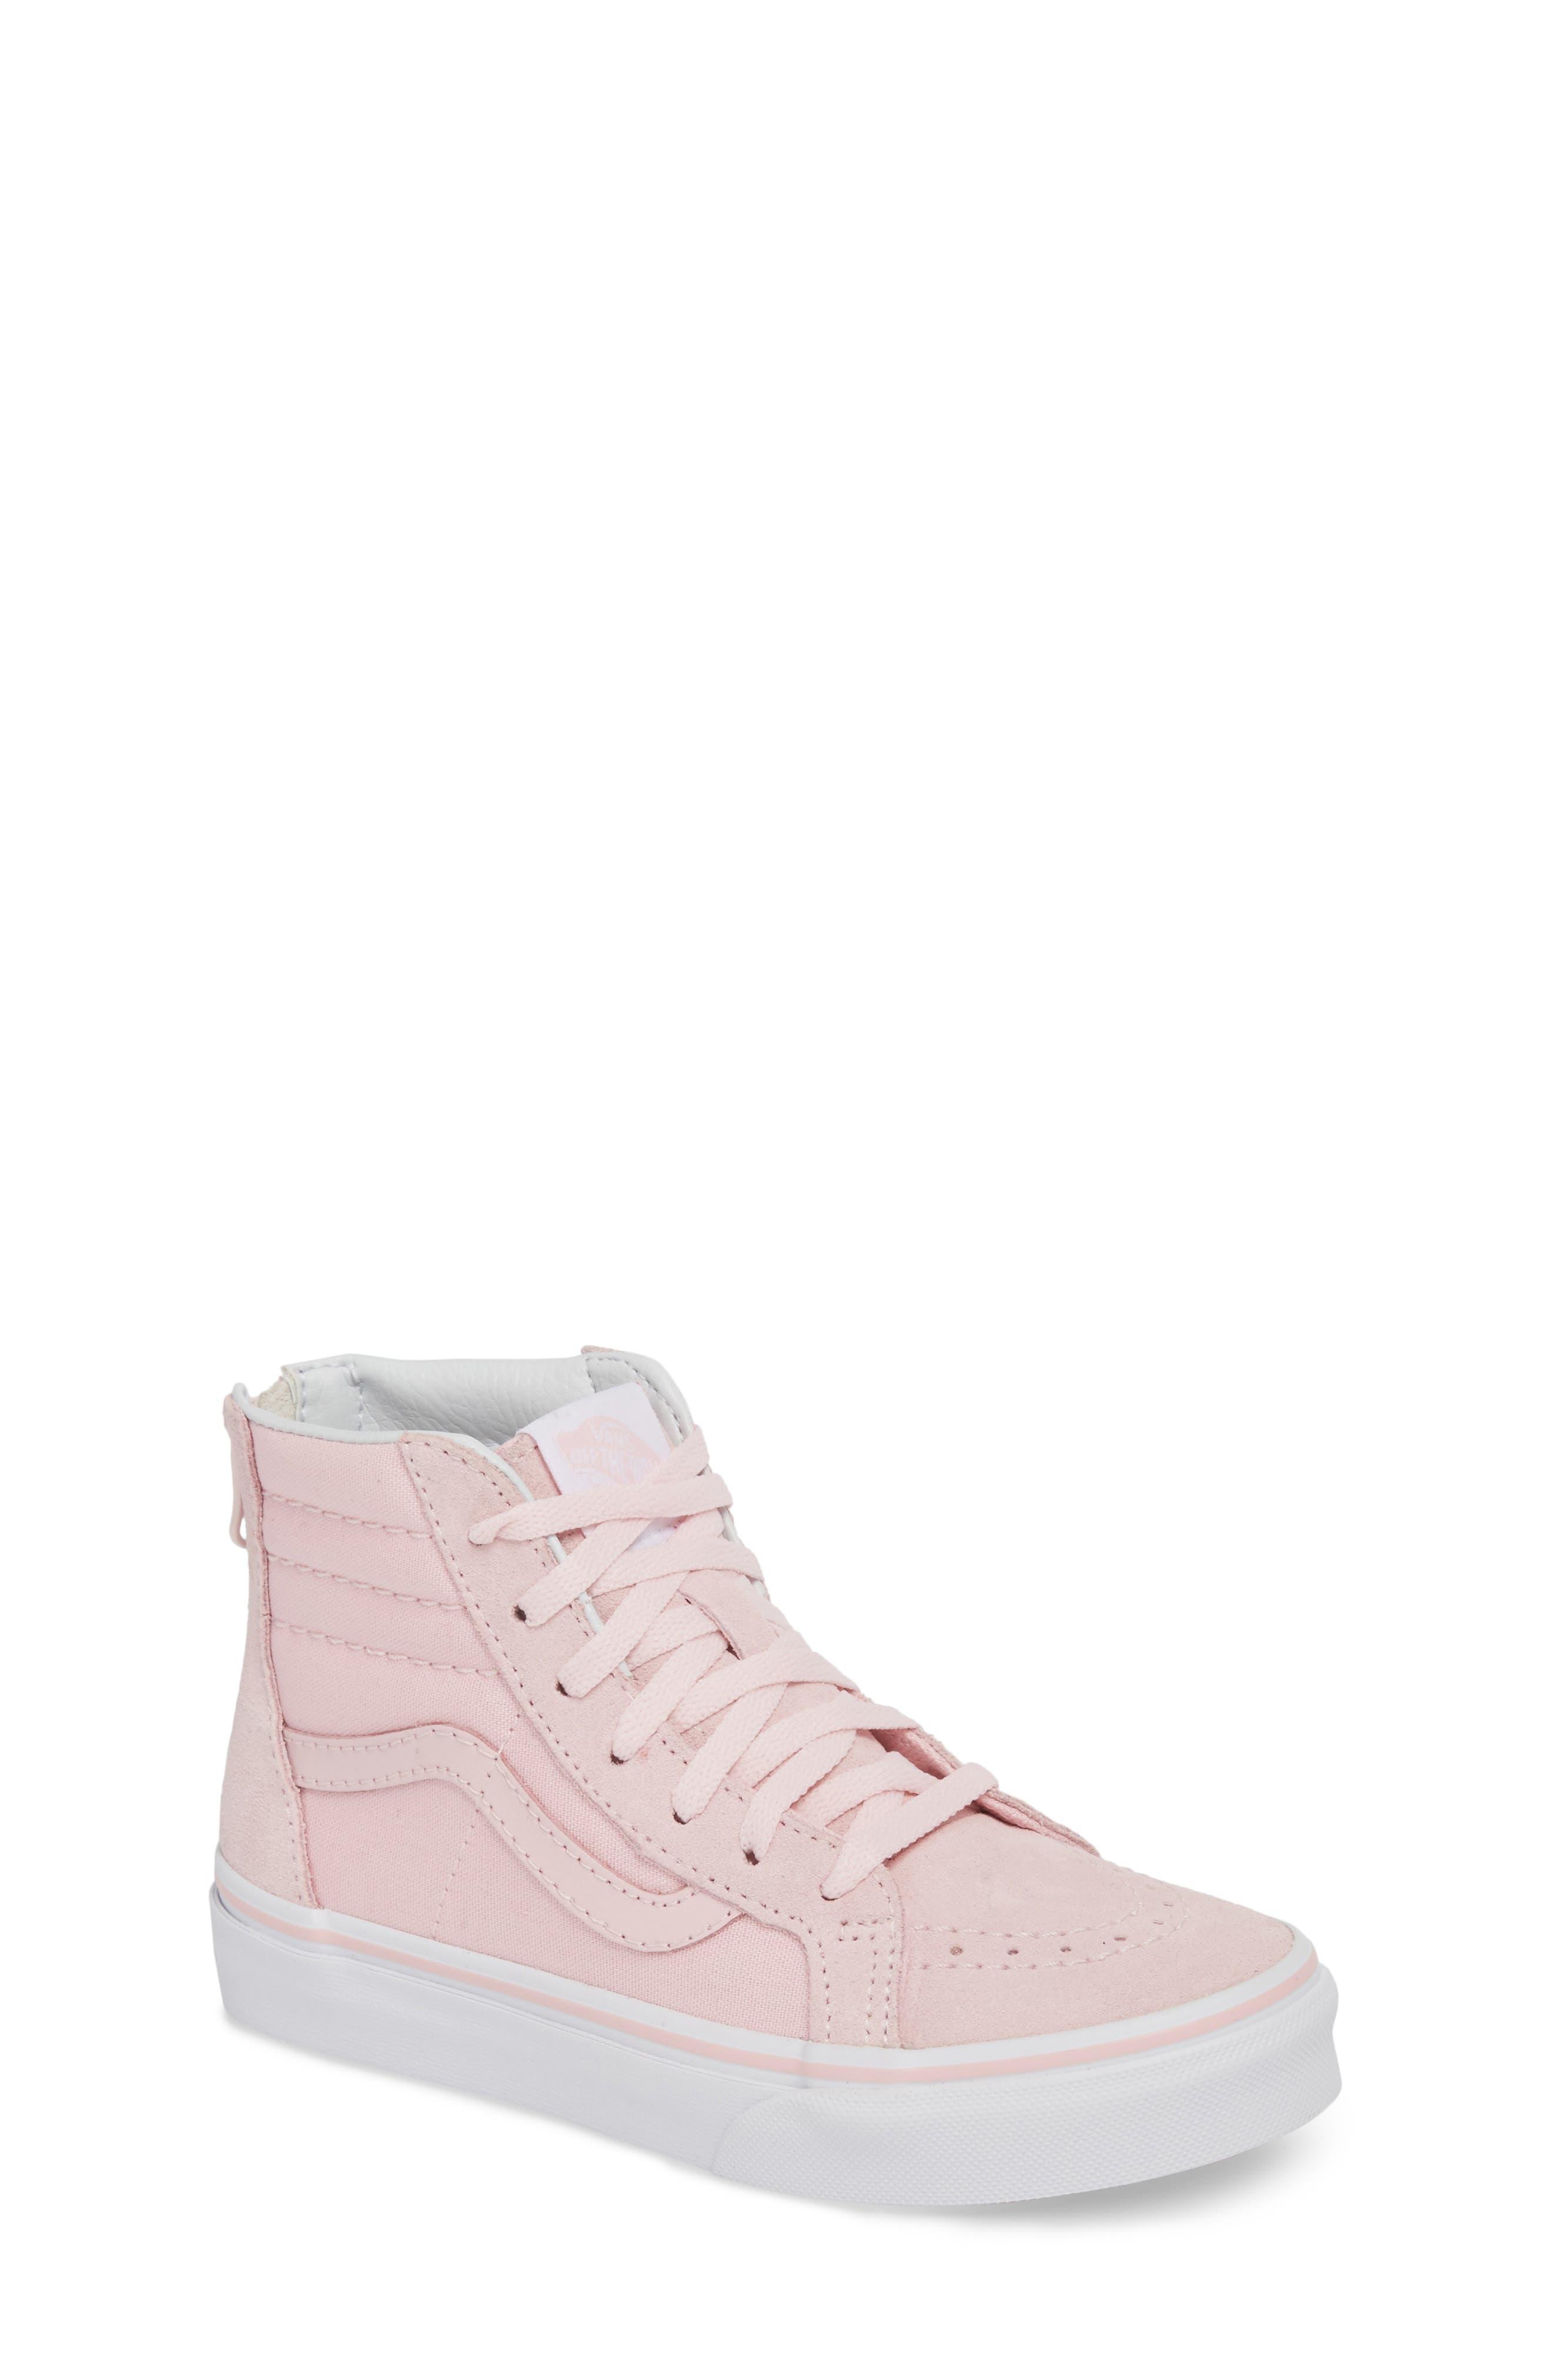 Sk8-Hi Zip Sneaker,                             Main thumbnail 1, color,                             CHALK PINK/ TRUE WHITE